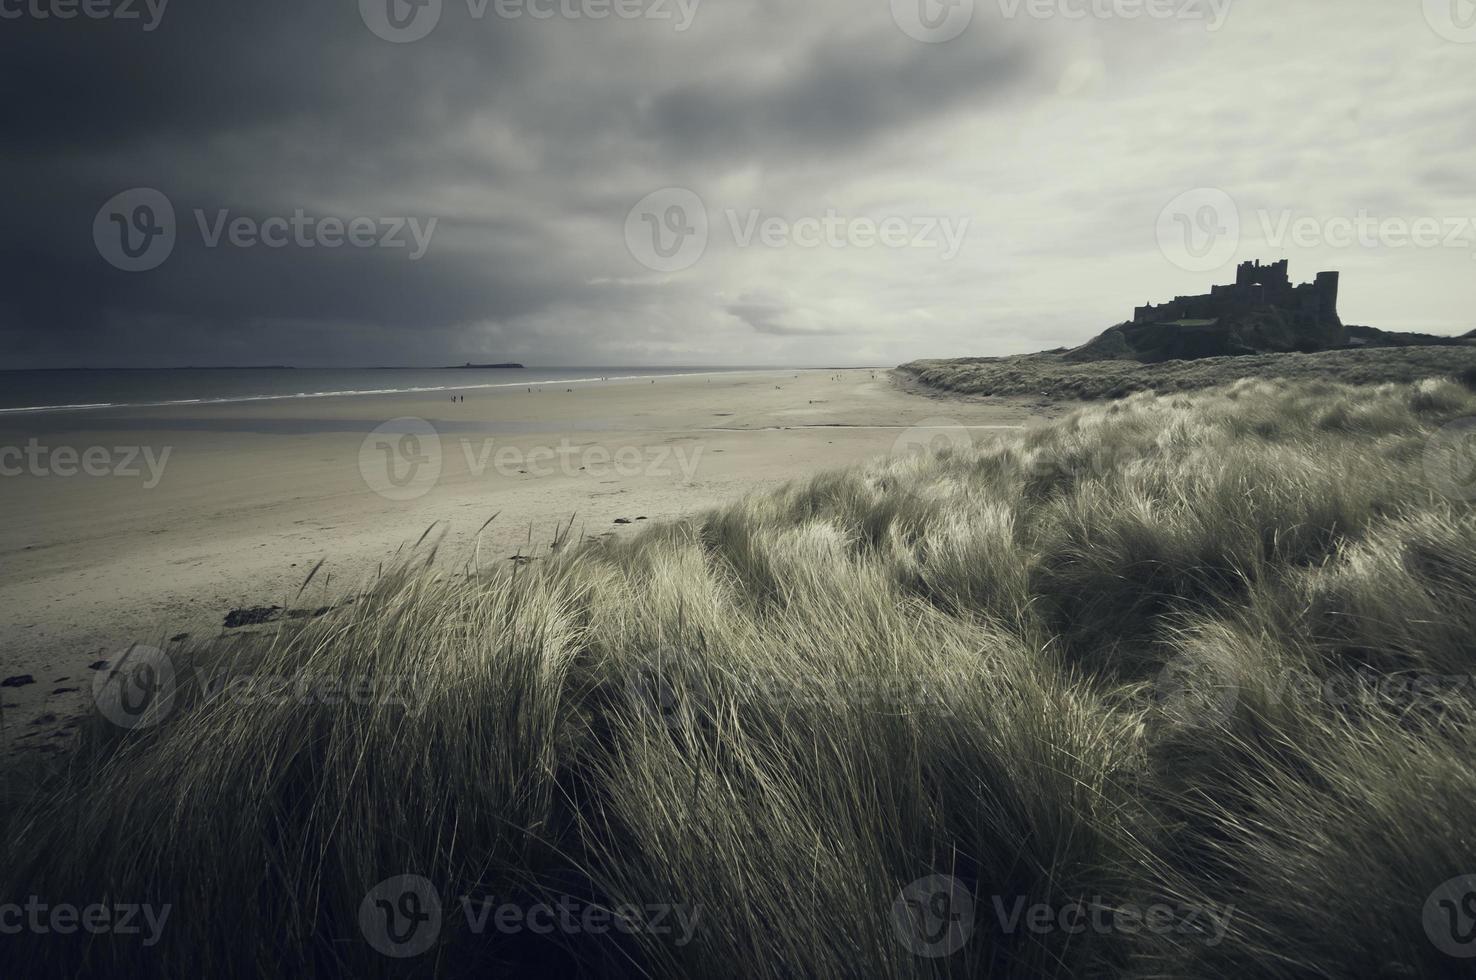 storma stranden, storma slottet foto